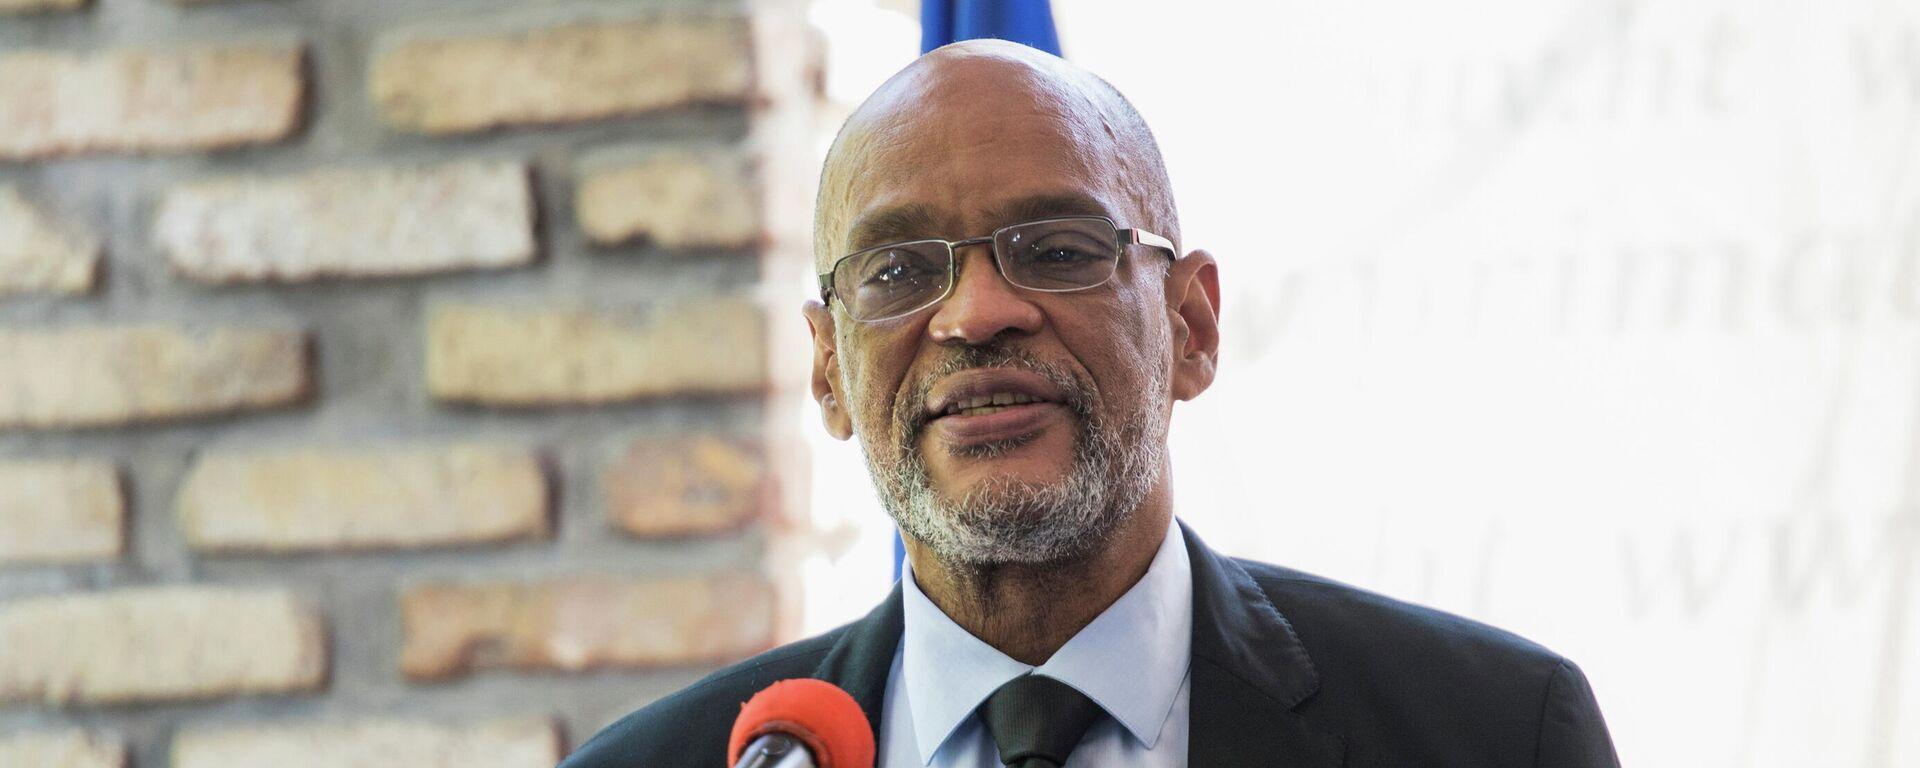 Ariel Henry, primer ministro de Haití - Sputnik Mundo, 1920, 12.09.2021